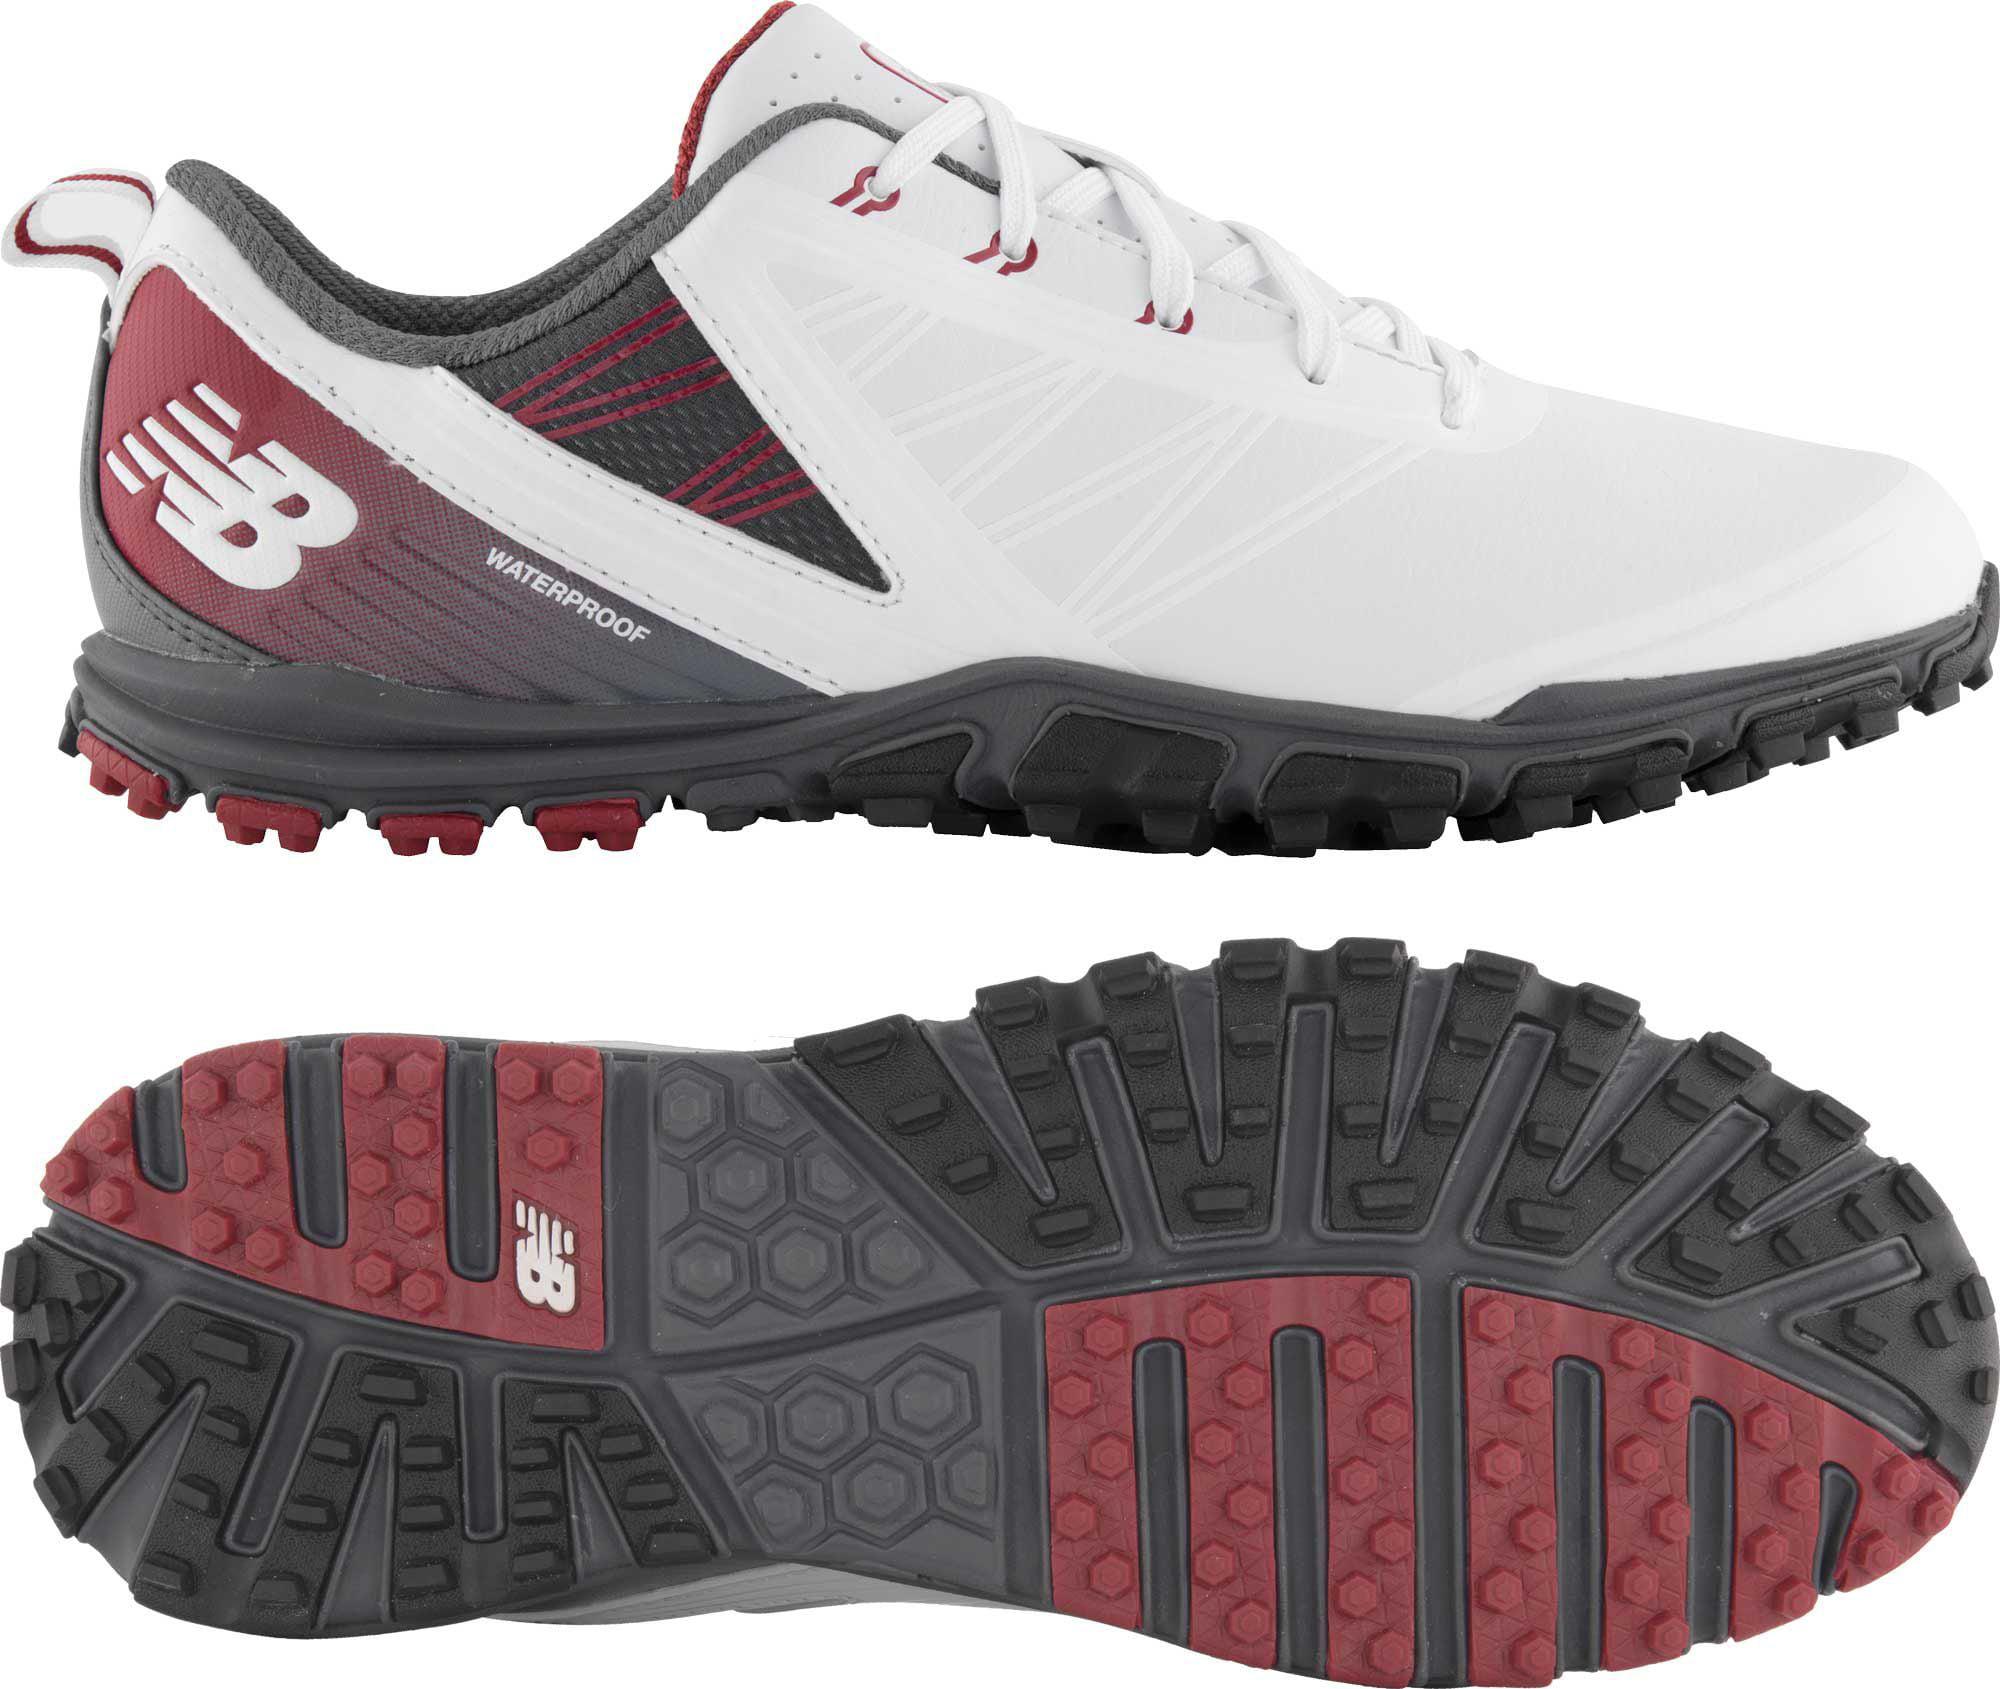 New Balance - New Balance Minimus SL Golf Shoes - Walmart ...